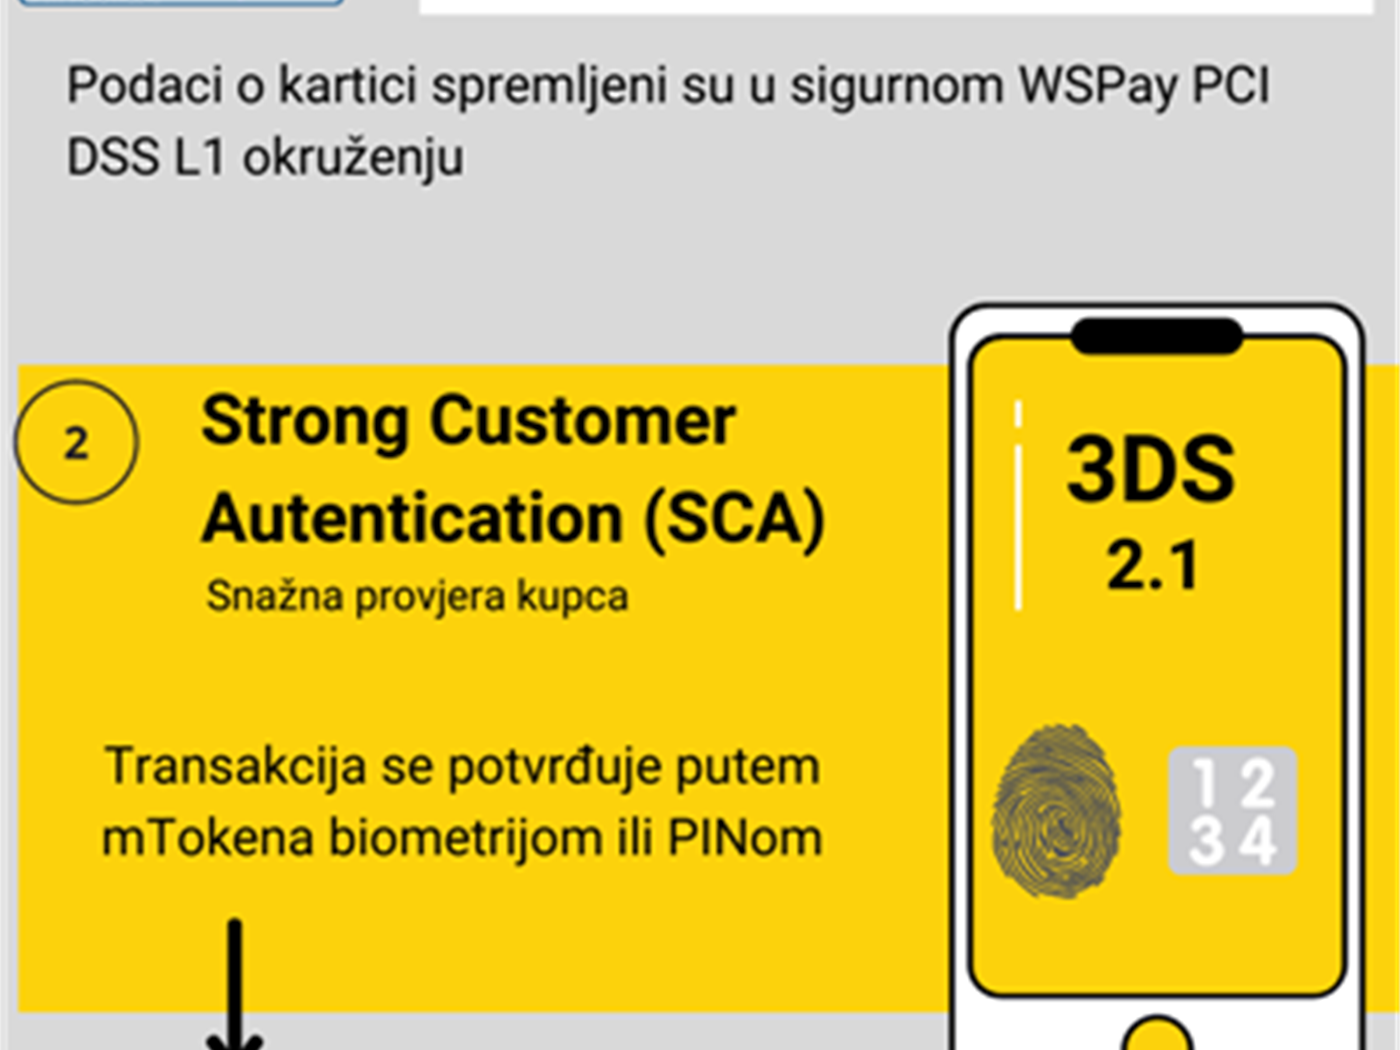 CIT transakcije - standardne i tokenizovane Card on File